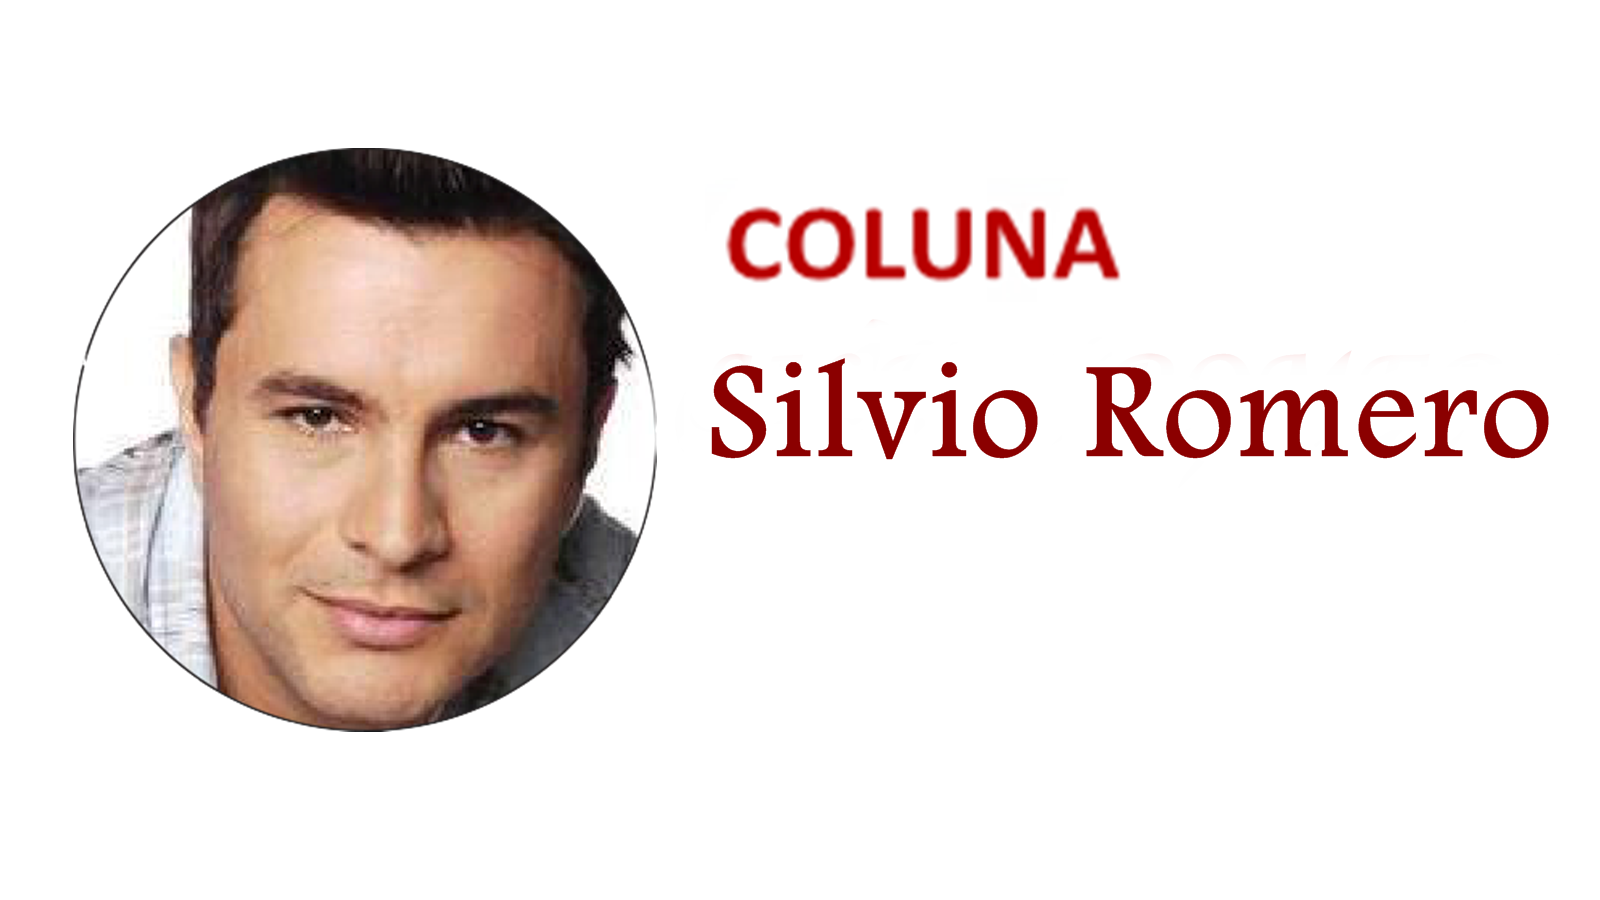 Coluna Fácil: Silvio Romero